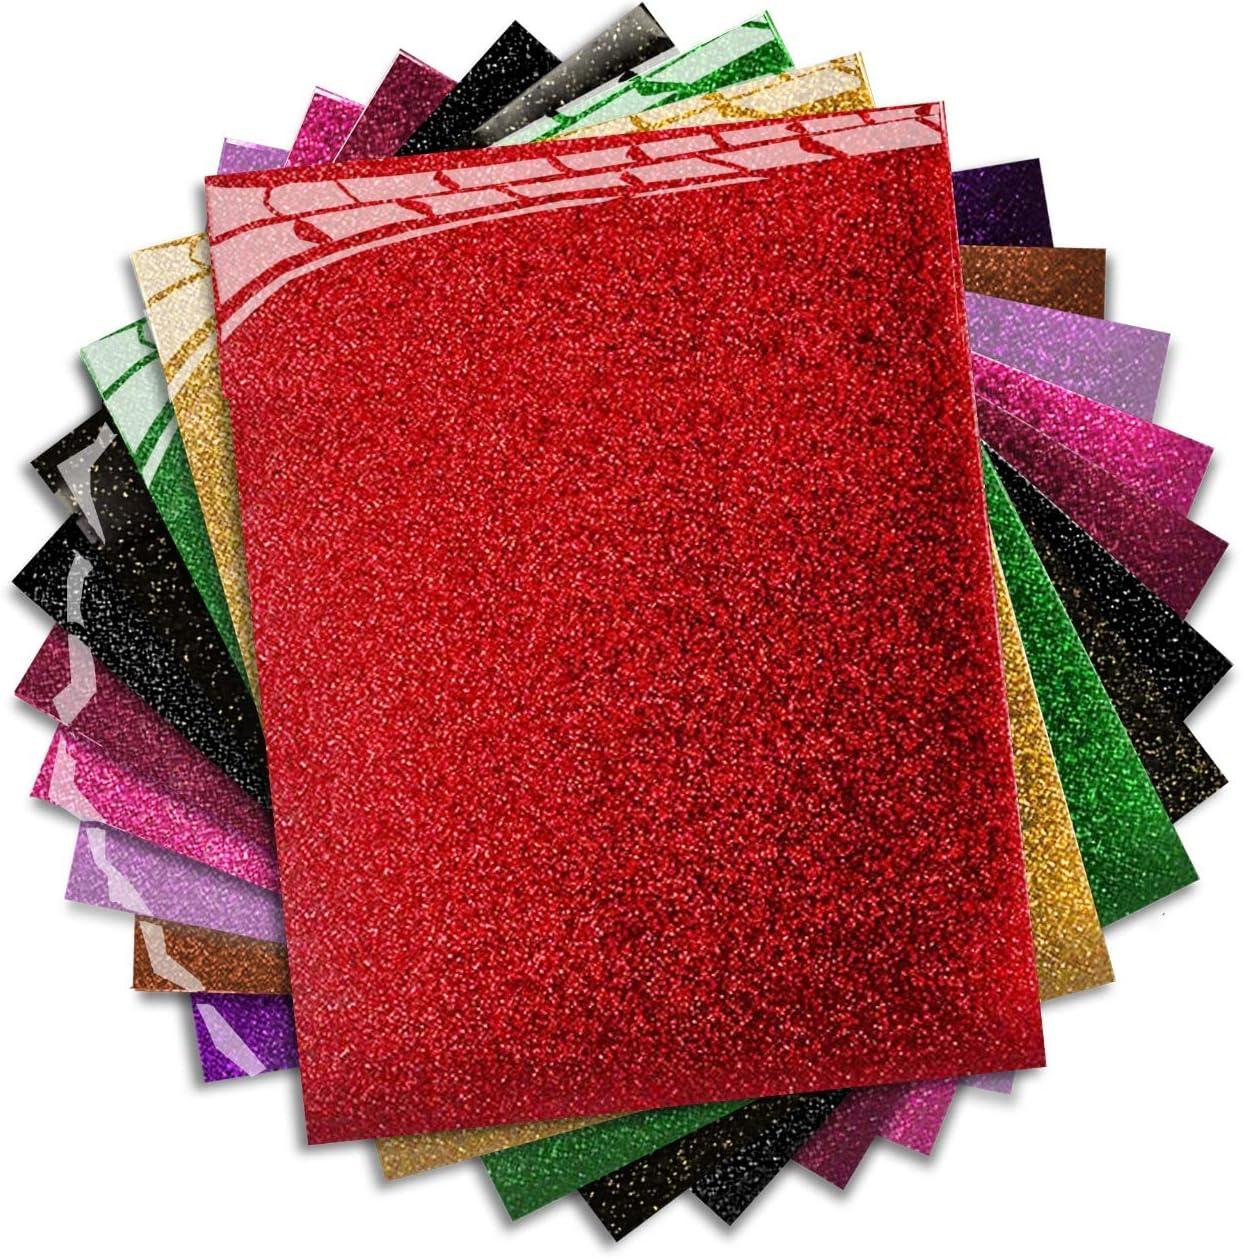 Iron On Vinyl Starter Pack Easy to Cut Weed /& Press Assorted Bundle Kit of Heat Press Vinyl in 10 Most Popular of HTV Glitter /& Plain Colors 10 x Pack MiPremium PU Heat Transfer Vinyl HTV